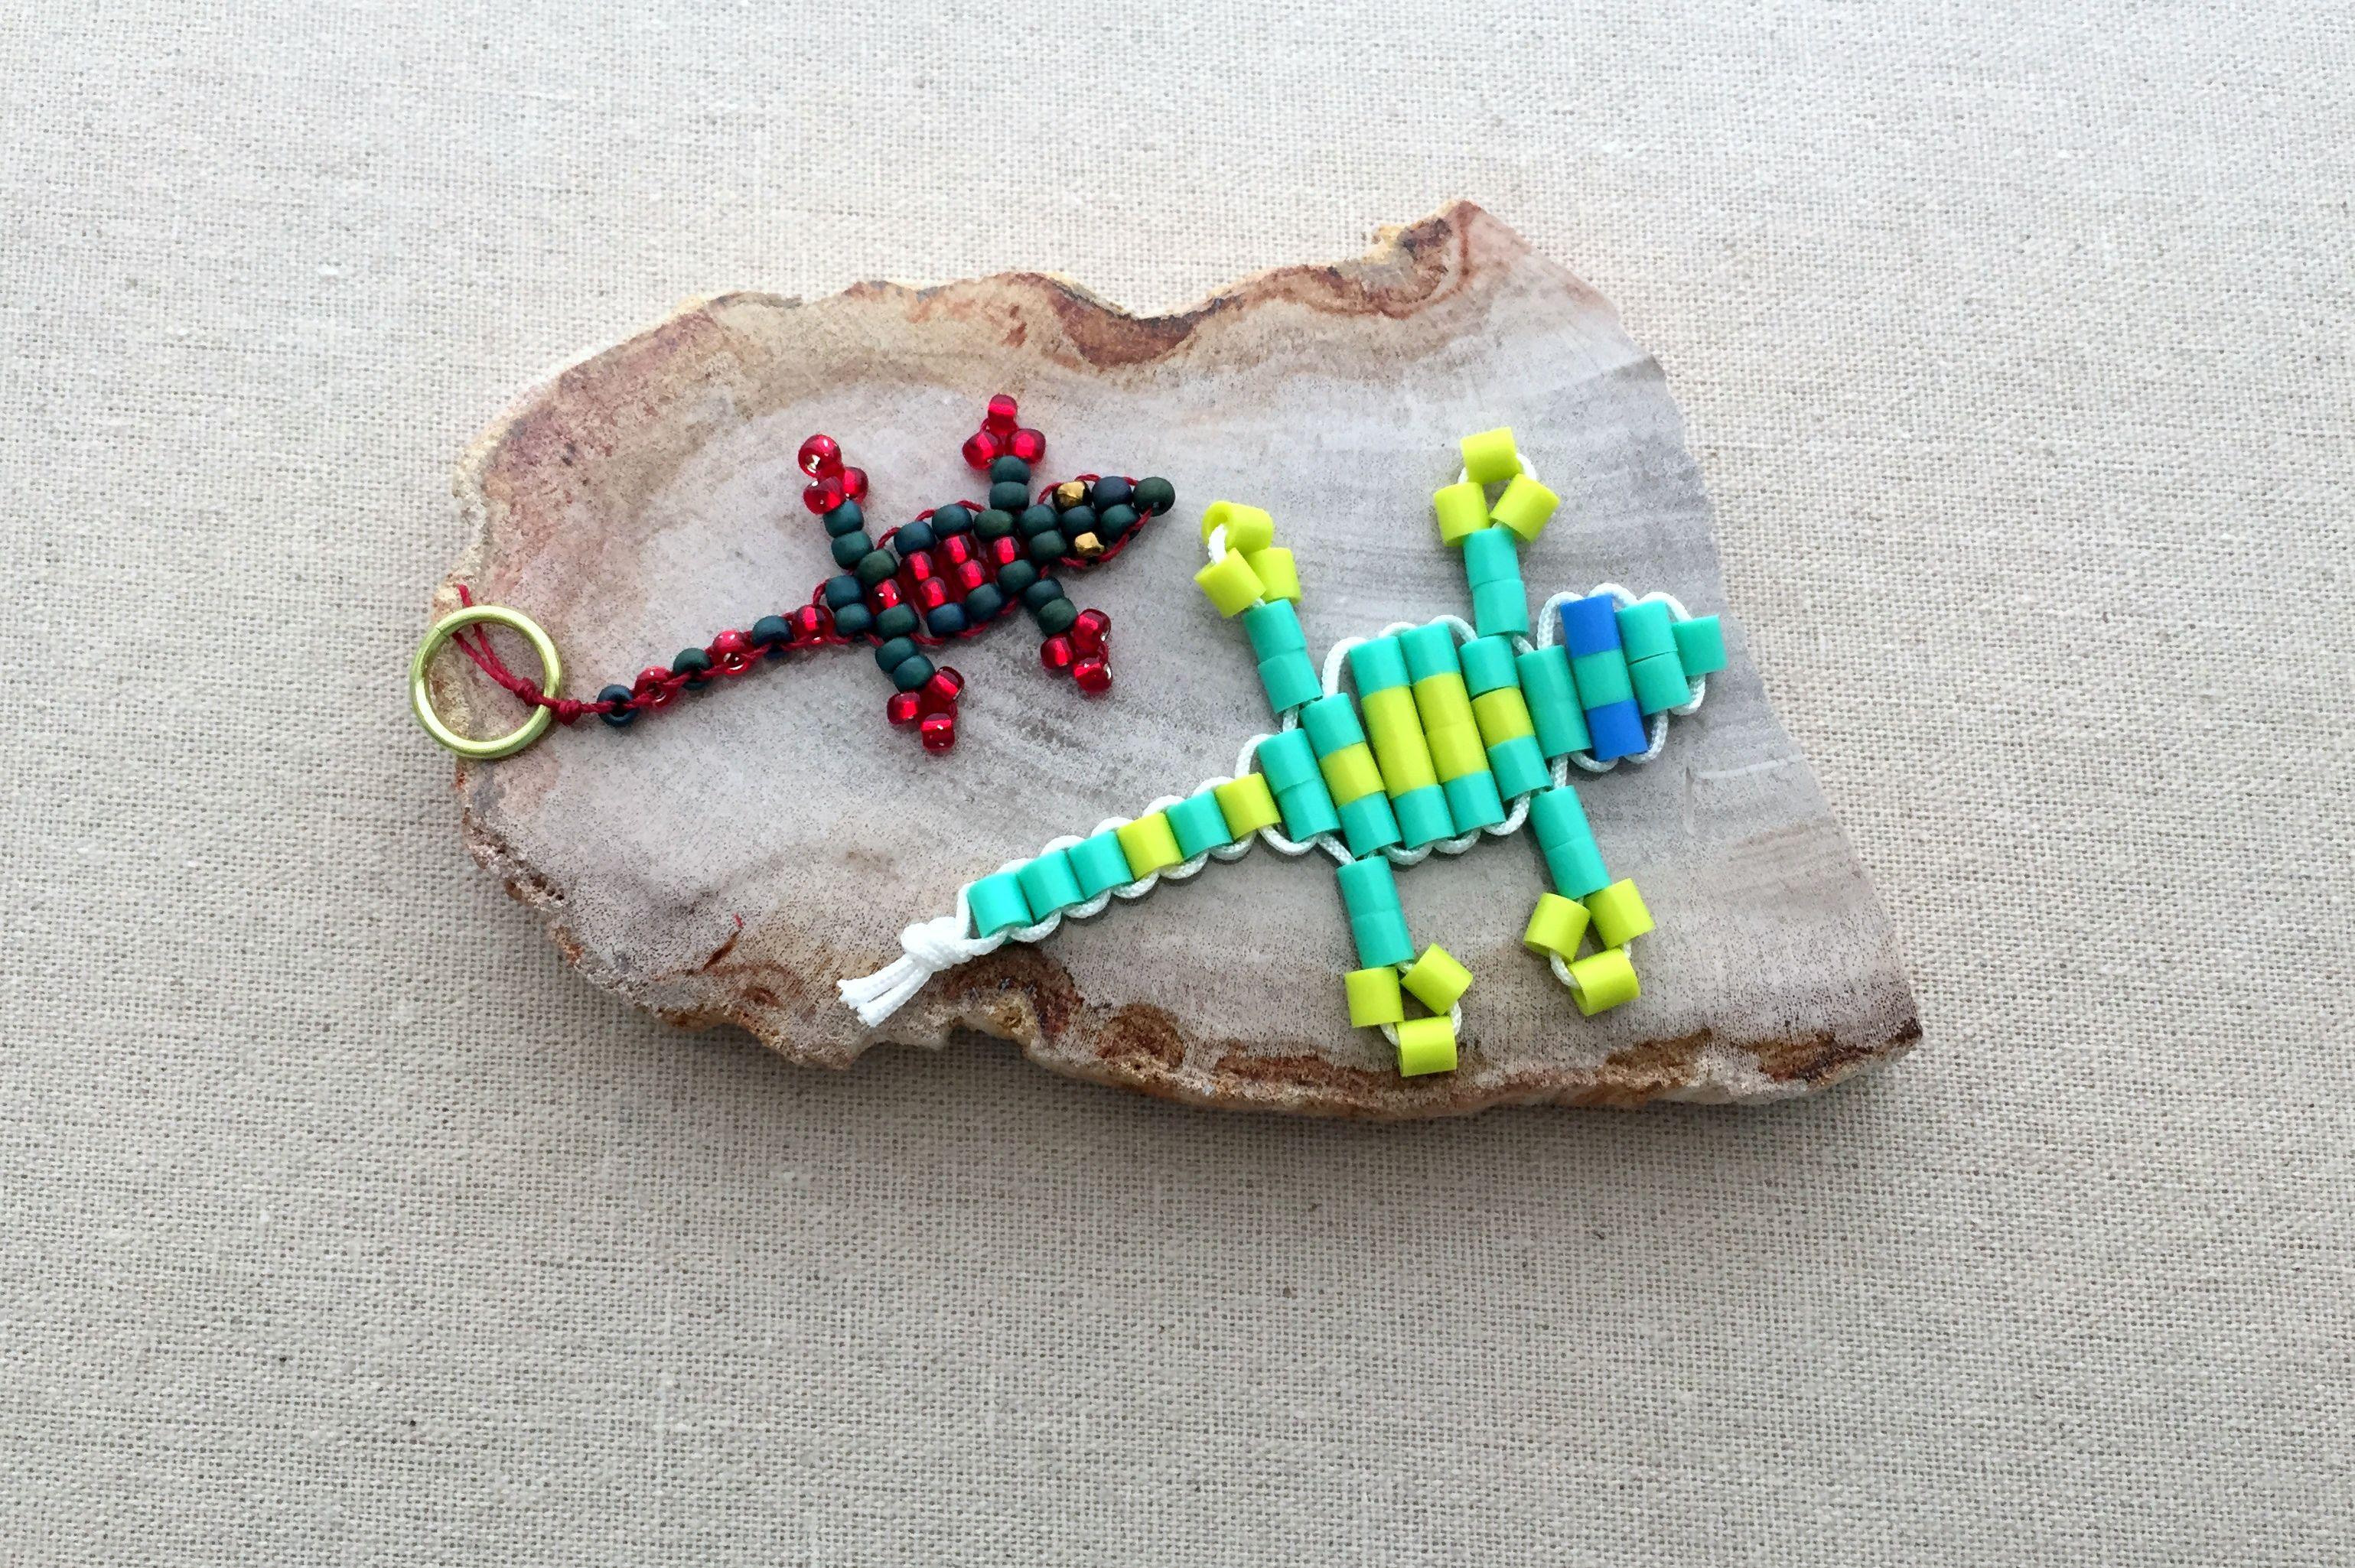 How to Make a Beaded Gecko Lizard Keychain ff5da624b223